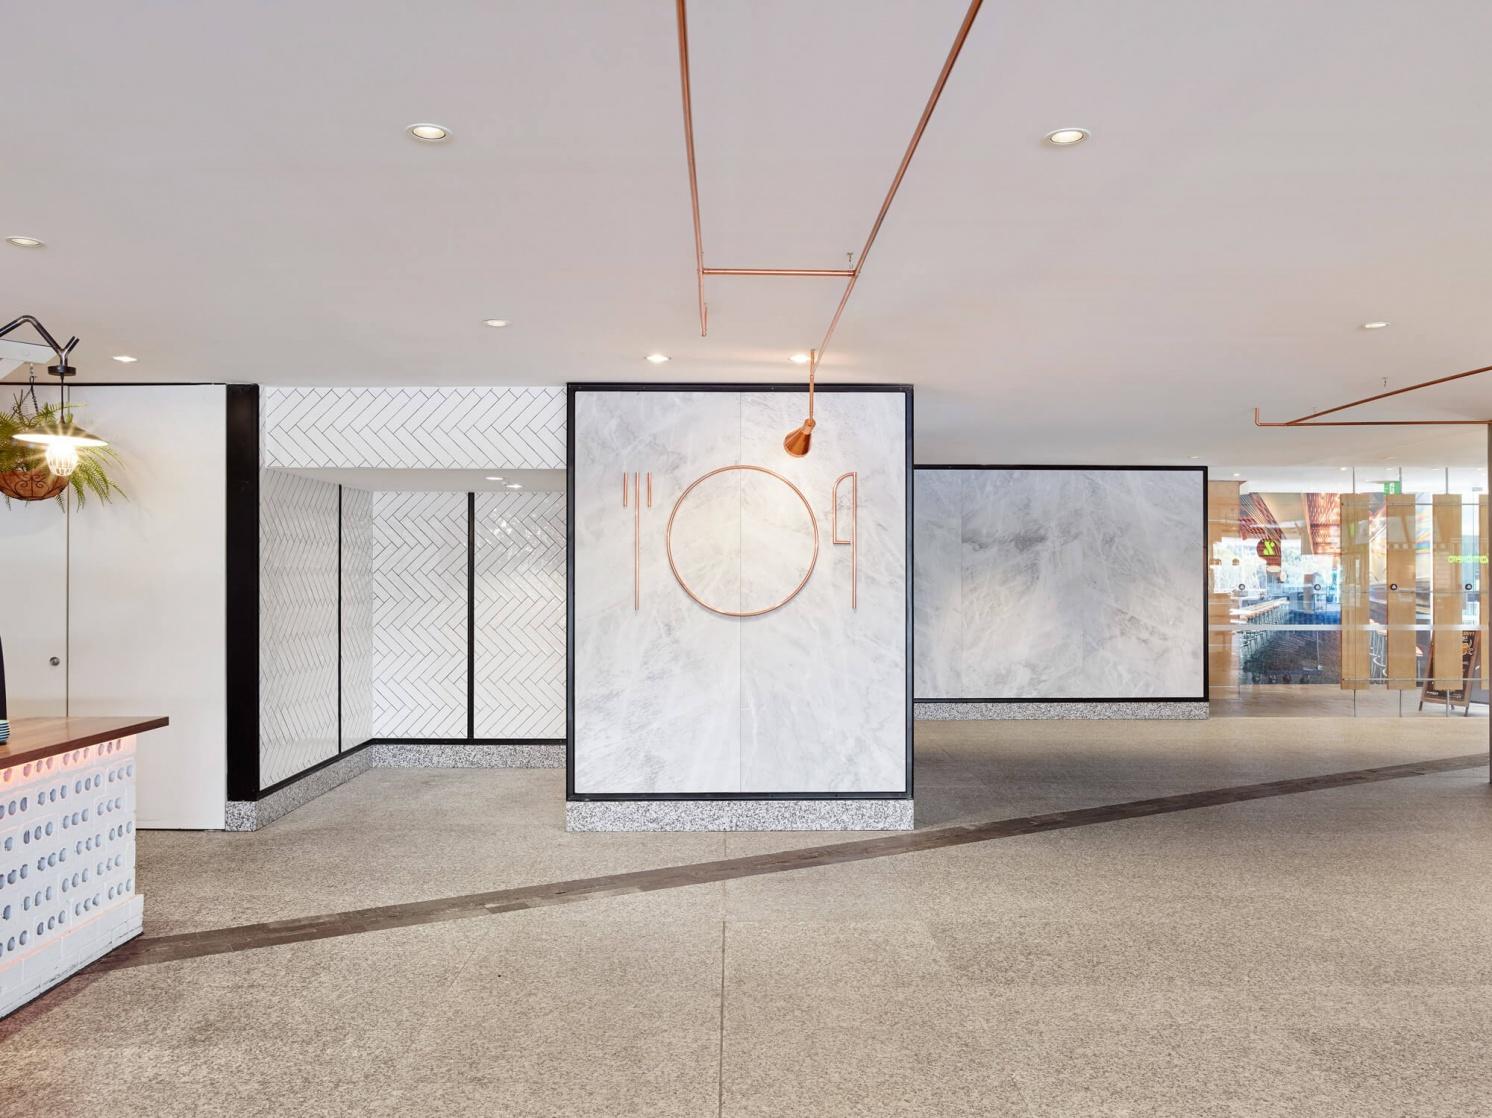 The entry to Riverside Food Court in Brisbane, Australia  image via identity and signage designer Tony Gooley